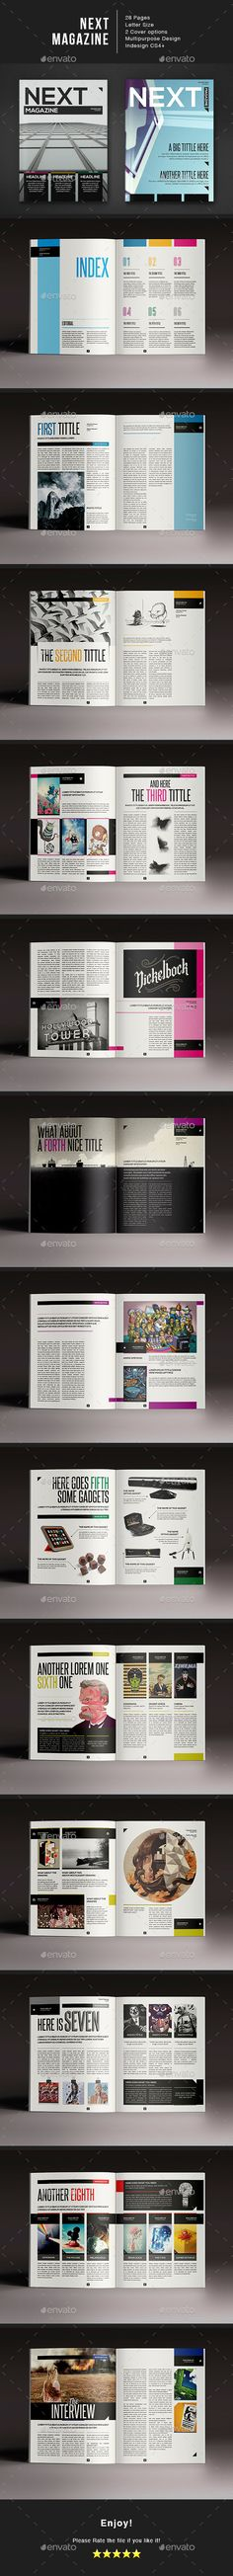 Next Magazine Template InDesign INDD #design Download: http://graphicriver.net/item/next-magazine-indesign-template/14445344?ref=ksioks